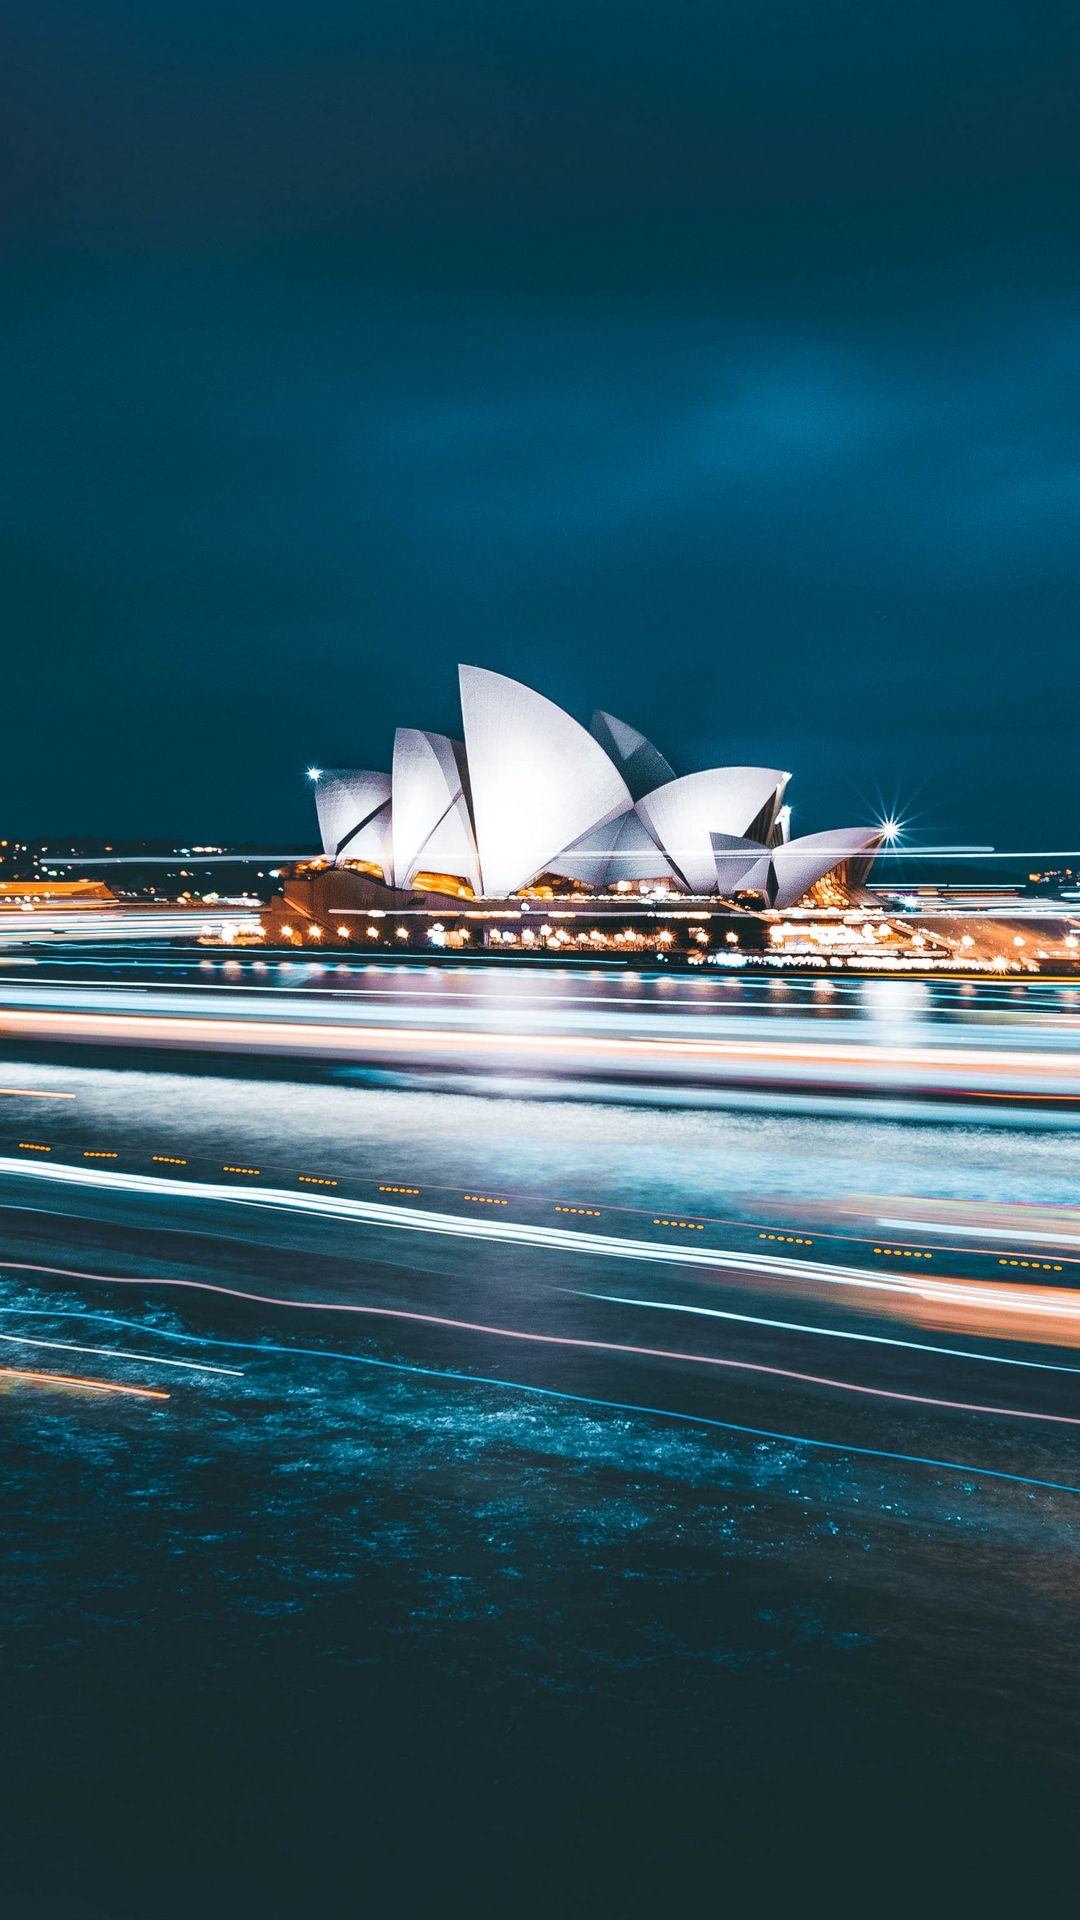 1080x1920 Wallpaper building, city, road, quay, sydney, australia